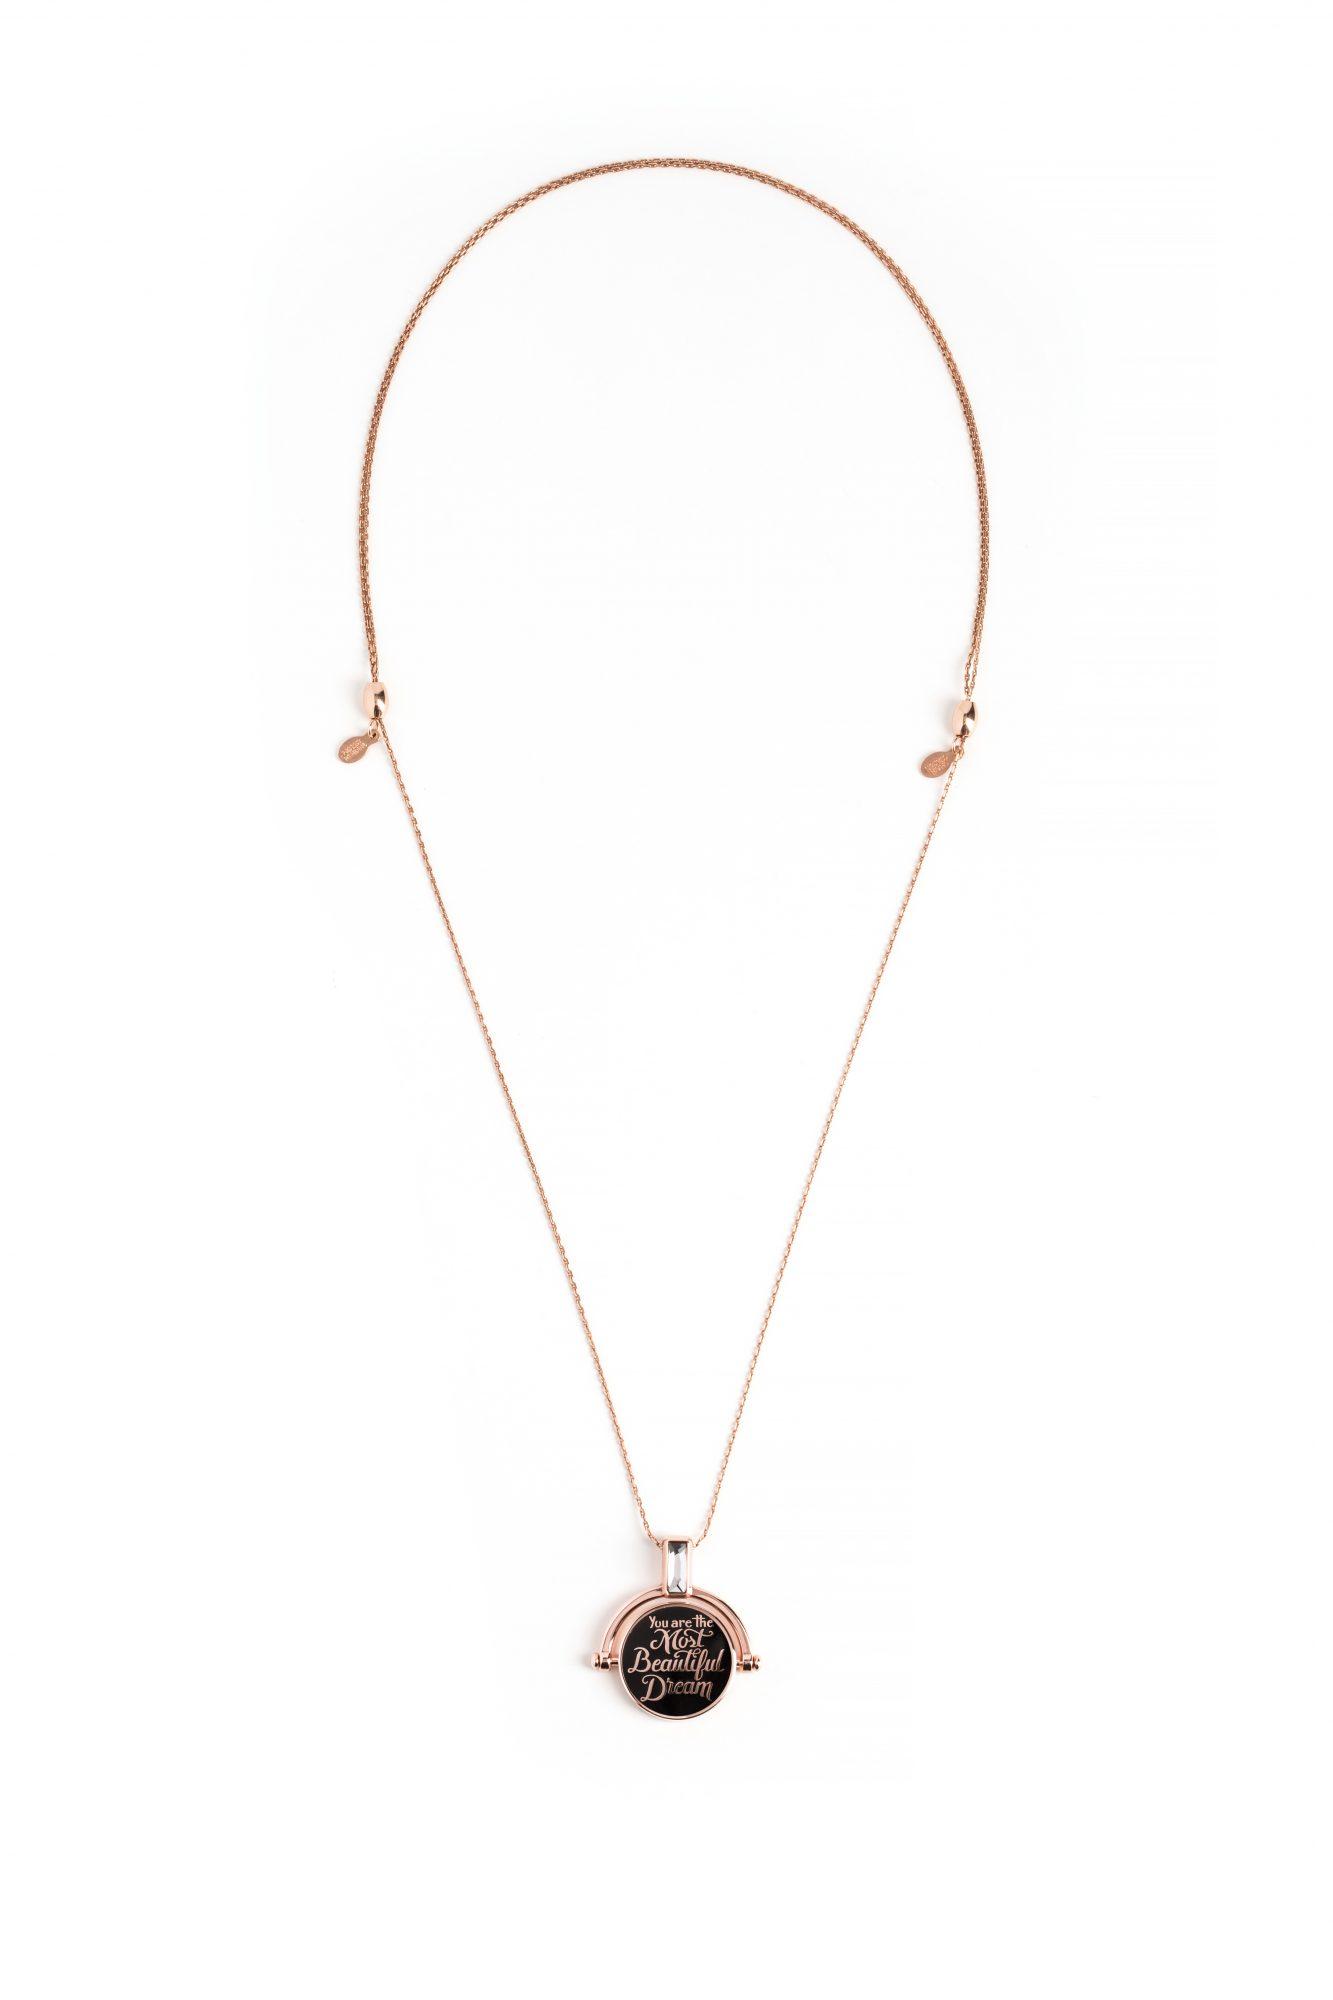 awit-beautiful-dream-necklace.jpg